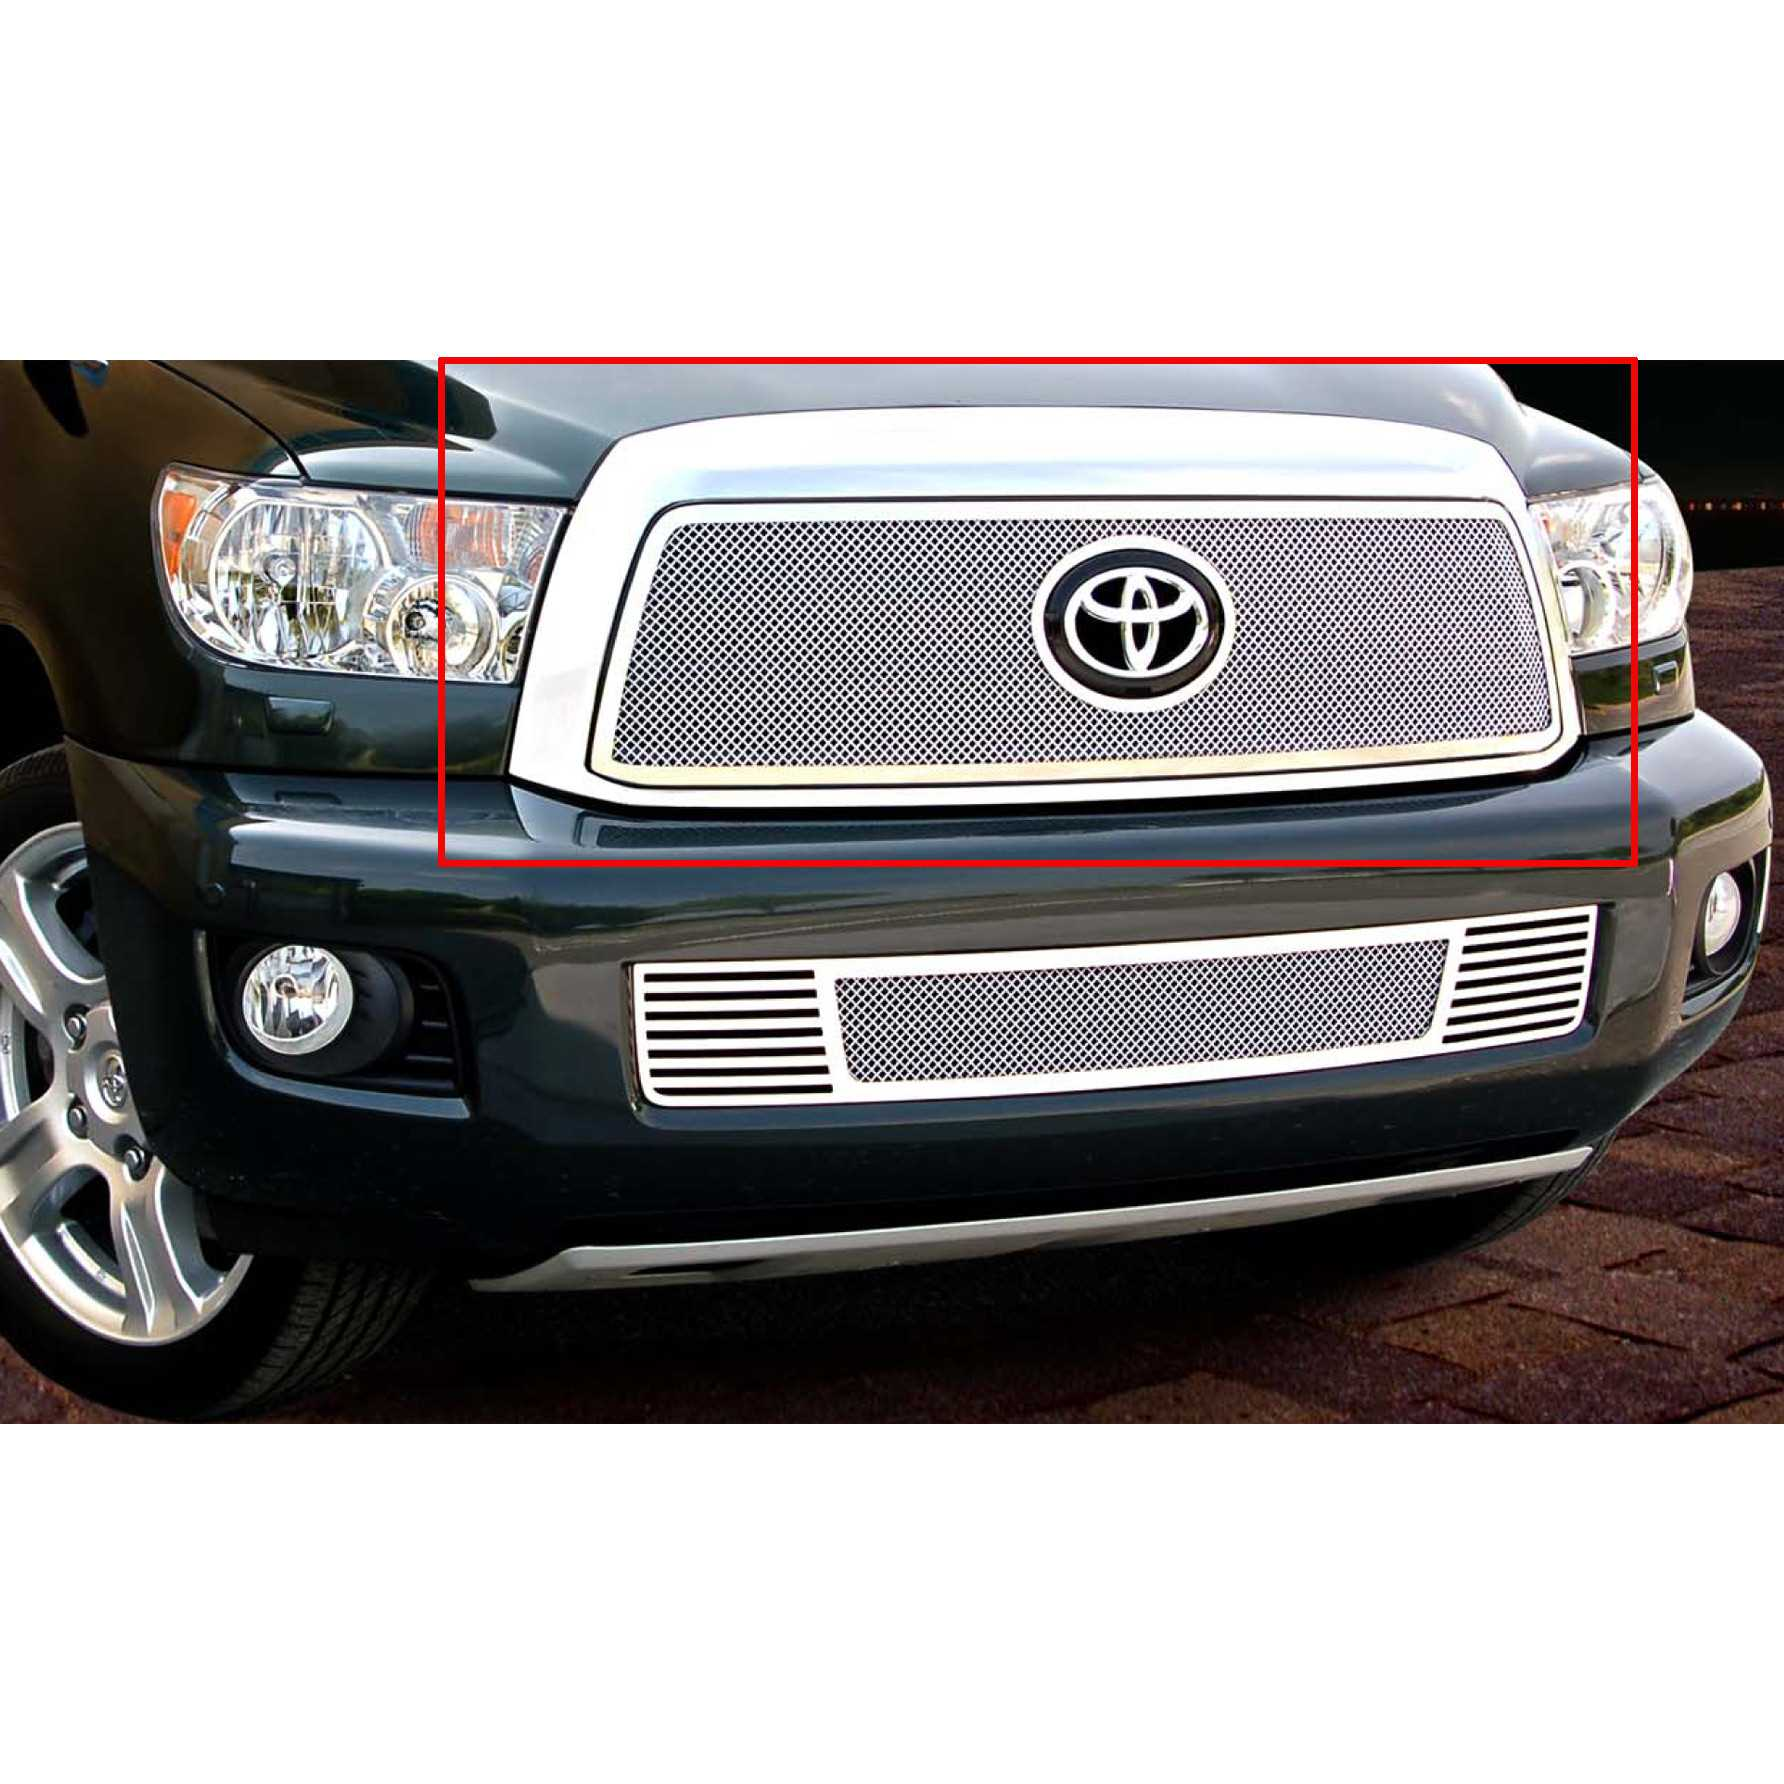 Toyota Sequoia: E&G Classics 2008-2016 Toyota Sequoia Grille Fine Mesh